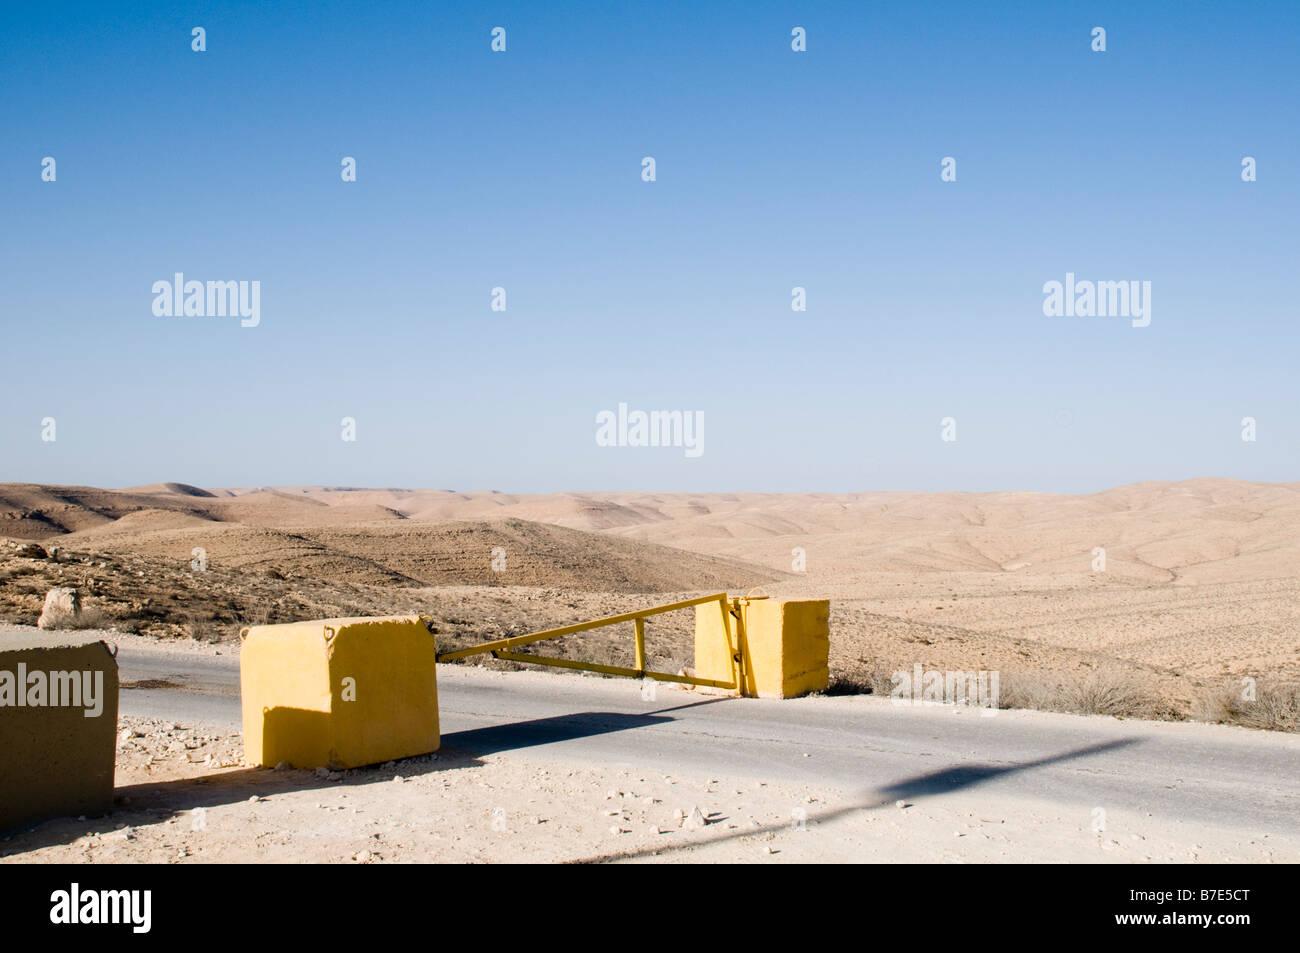 Israel Negev Desert Harif Mountain 1 012m on the Egyptian border A roadblock on the border road - Stock Image